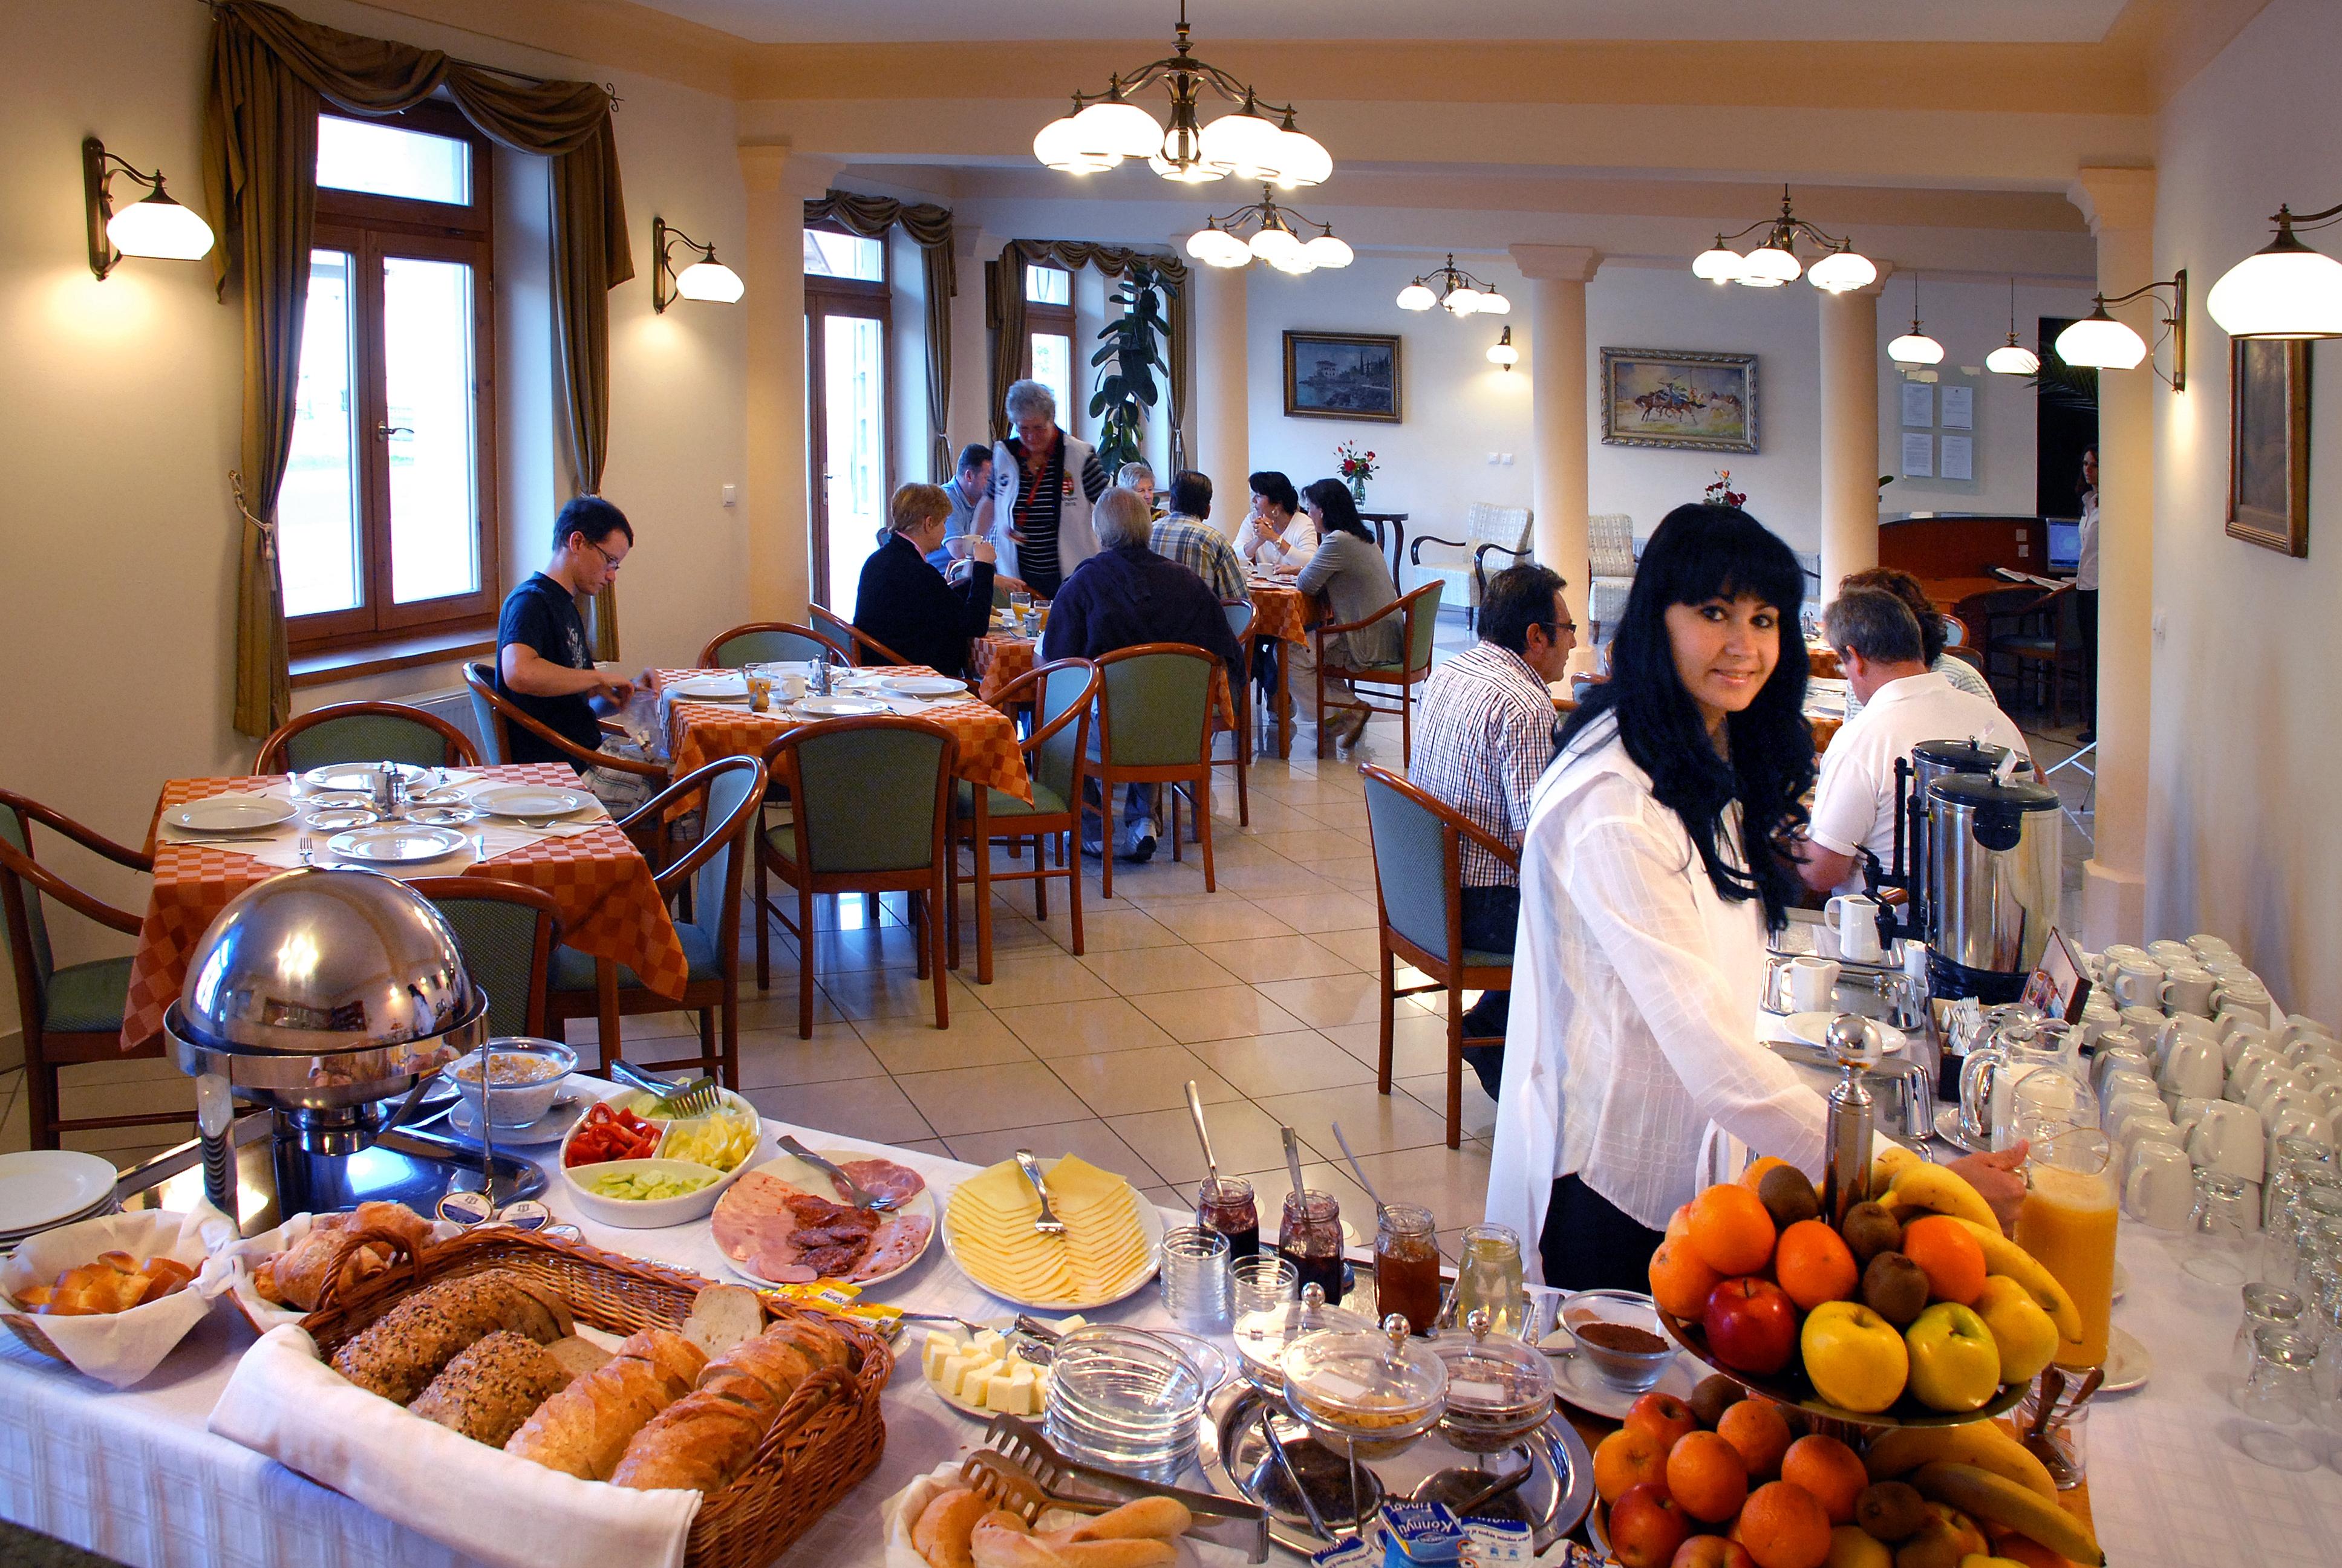 spa-wellness/banja-harkanj/hotel-ametizst/ametiszt-hotel-restoran.JPG